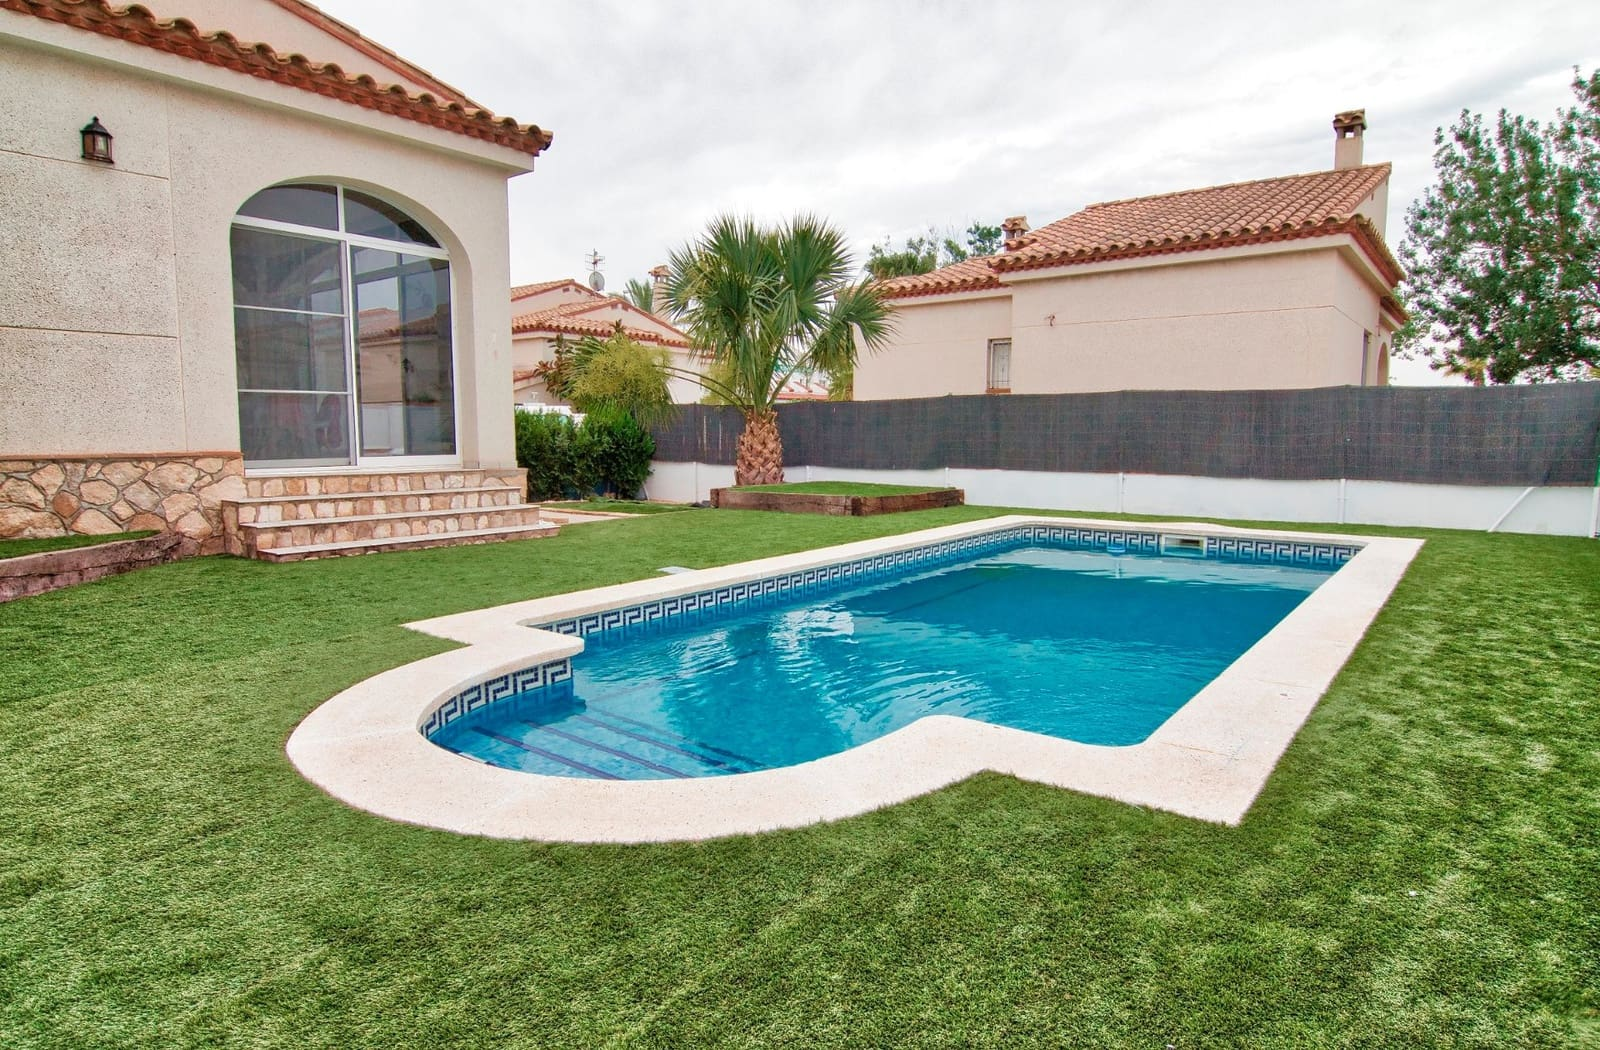 2 bedroom Villa for holiday rental in Deltebre with pool - € 840 (Ref: 4859024)